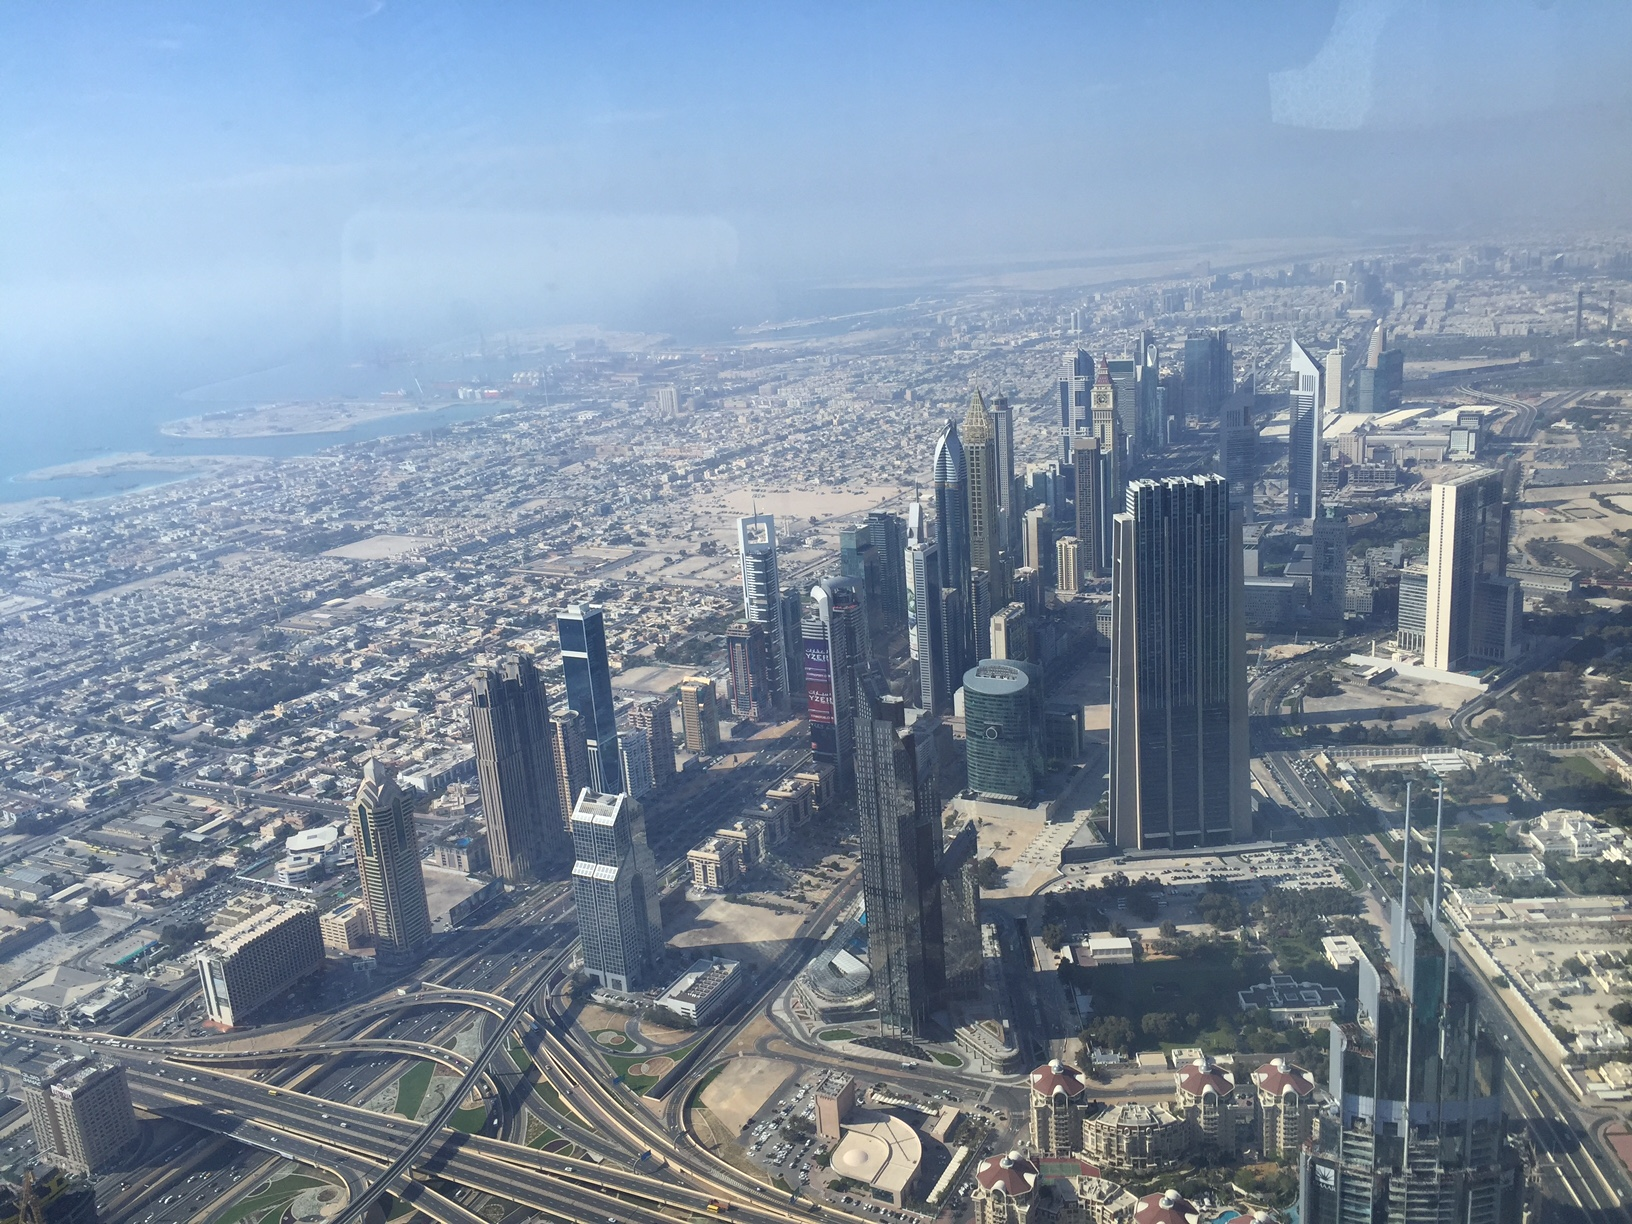 View on top of Burj Khalifa Dubai